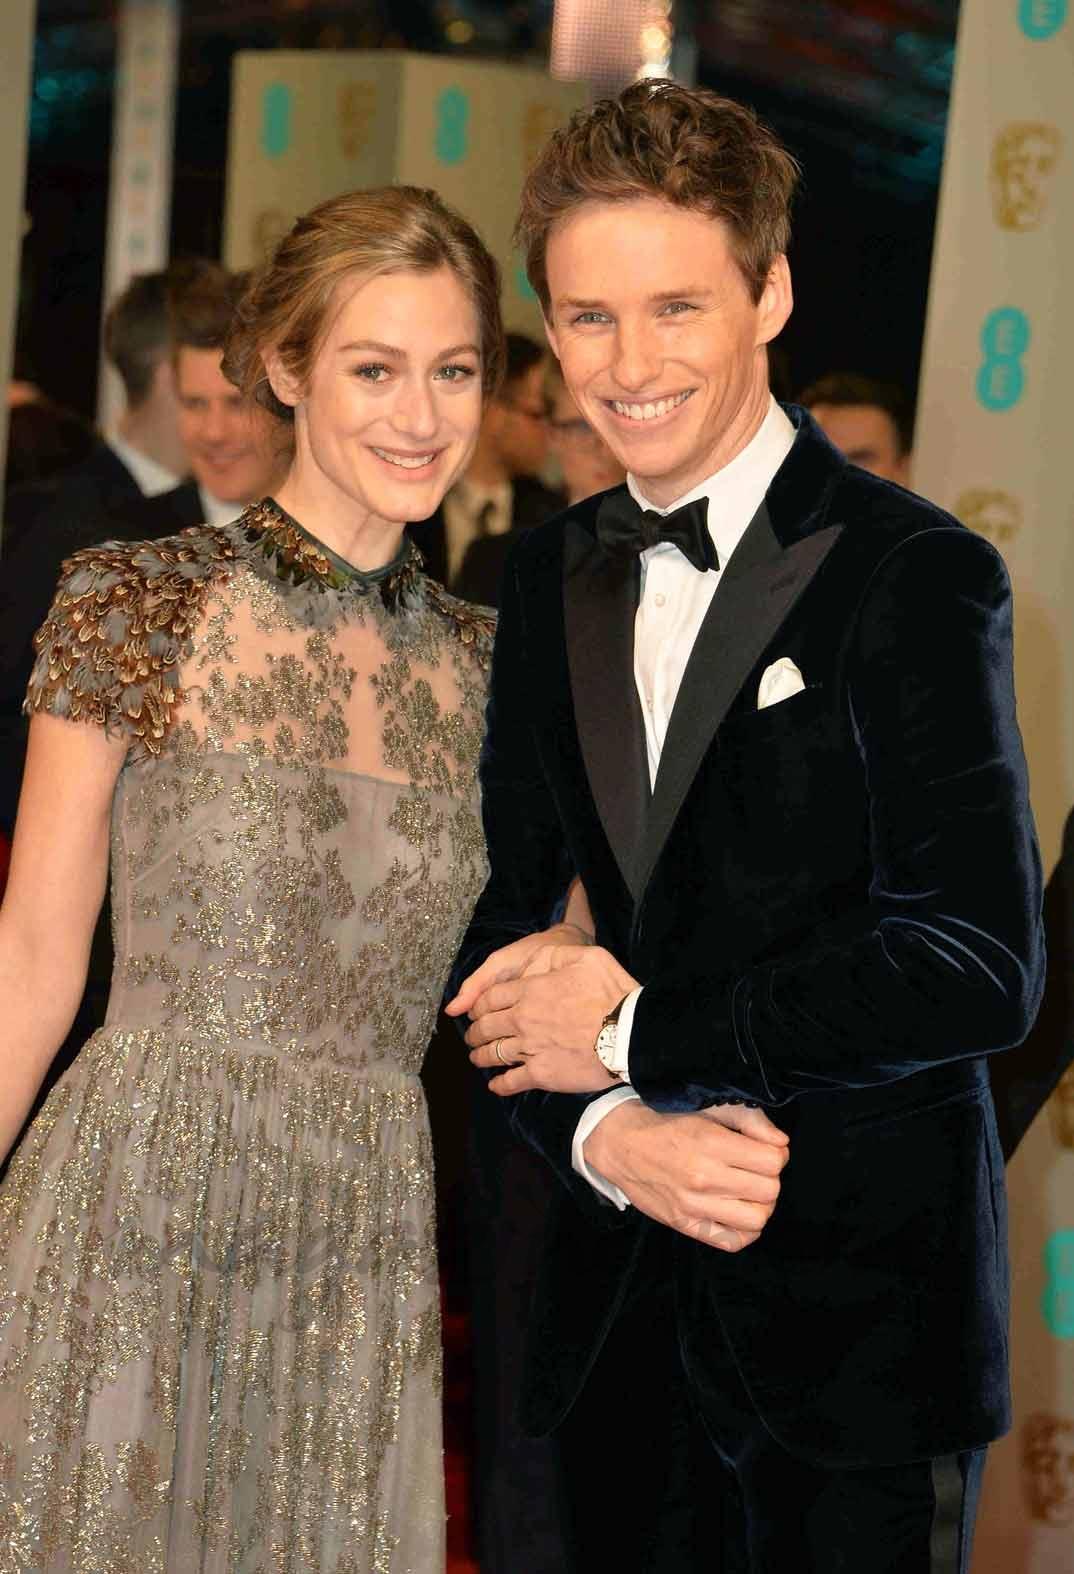 Eddie Redmayne y su esposa Hannah Bagshawe. Foto/magazinespain.com